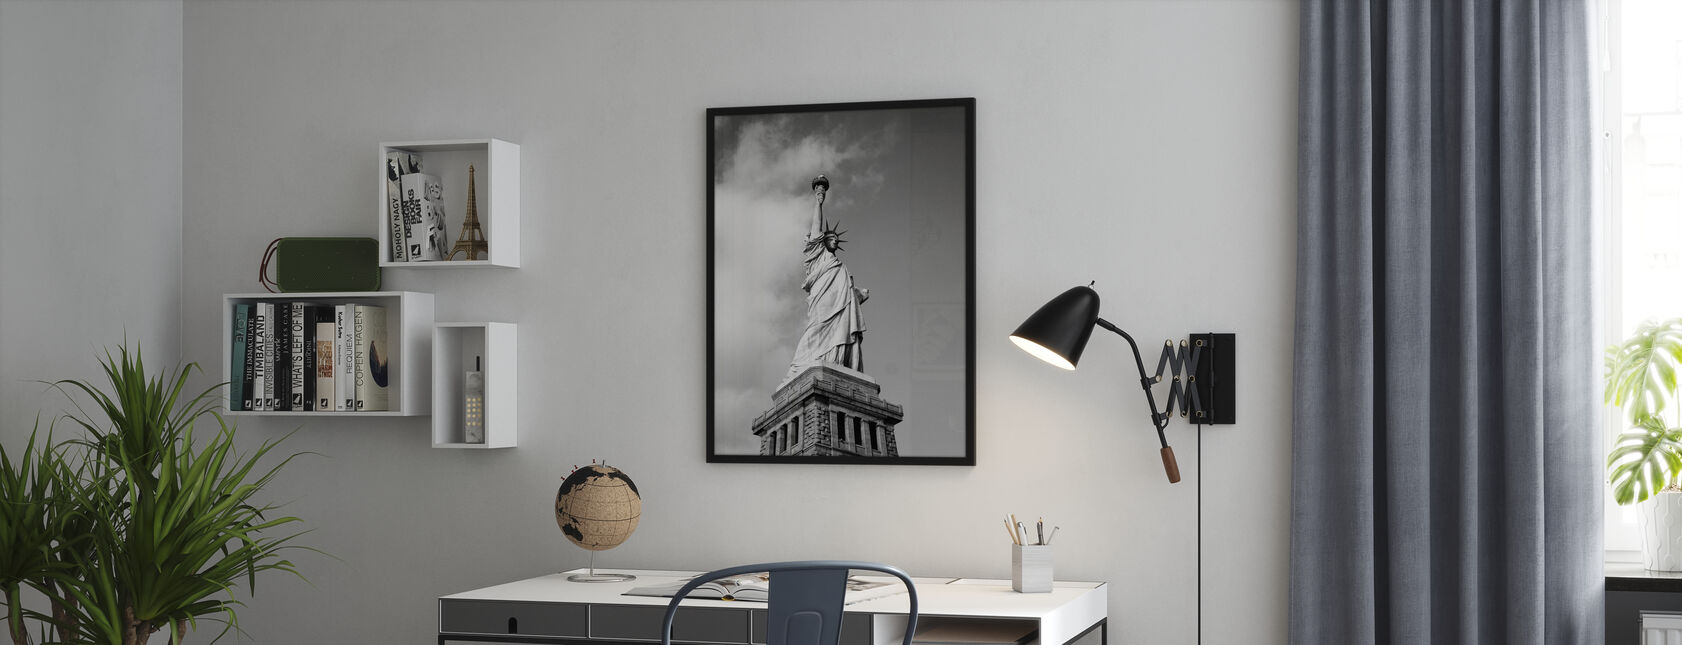 Vintage Frihetsgudinnan - Poster - Kontor